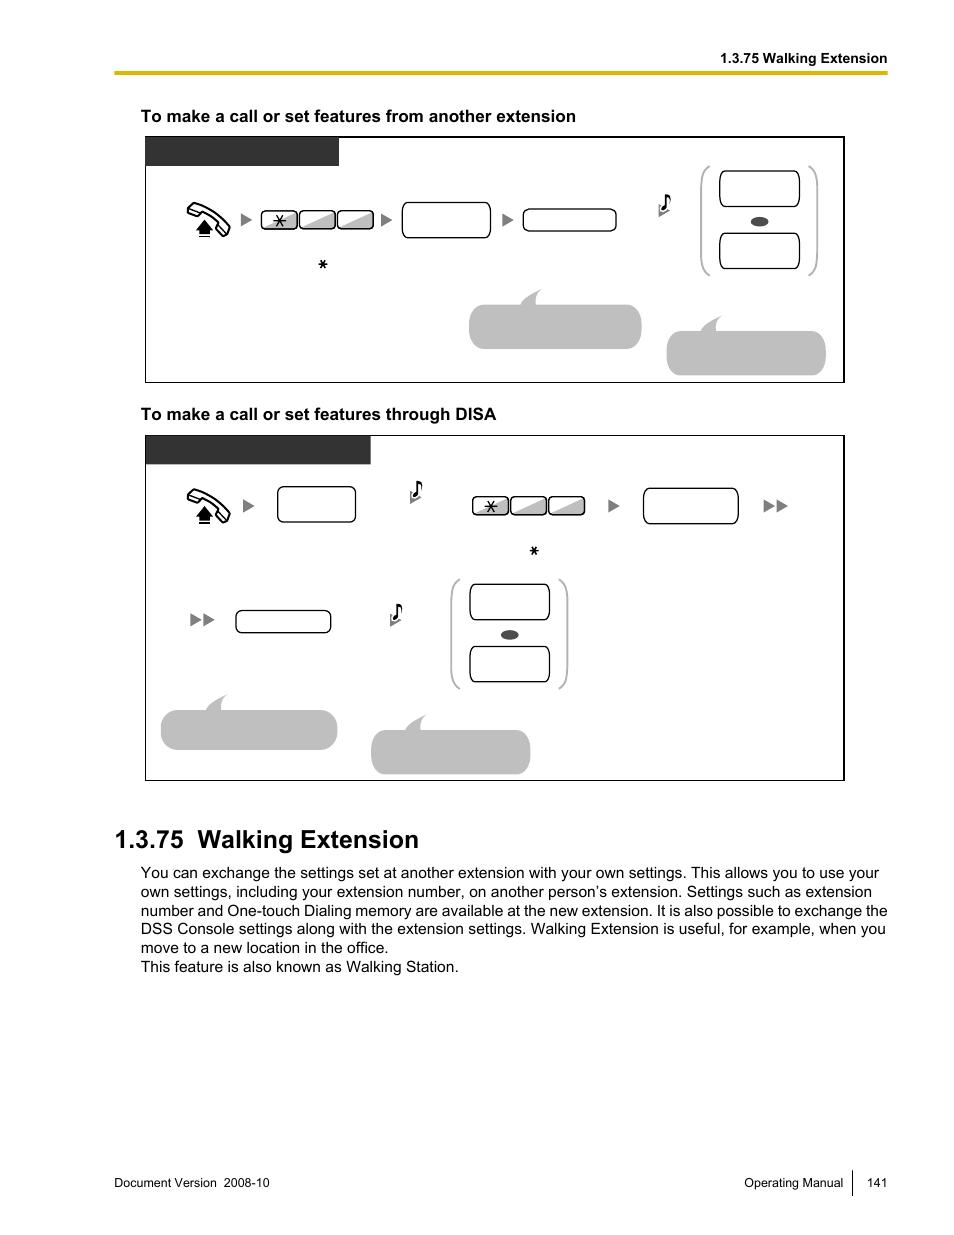 75 walking extension walking extension panasonic kx tde200 user rh manualsdir com panasonic tde200 programming manual panasonic kx-tde200 installation manual